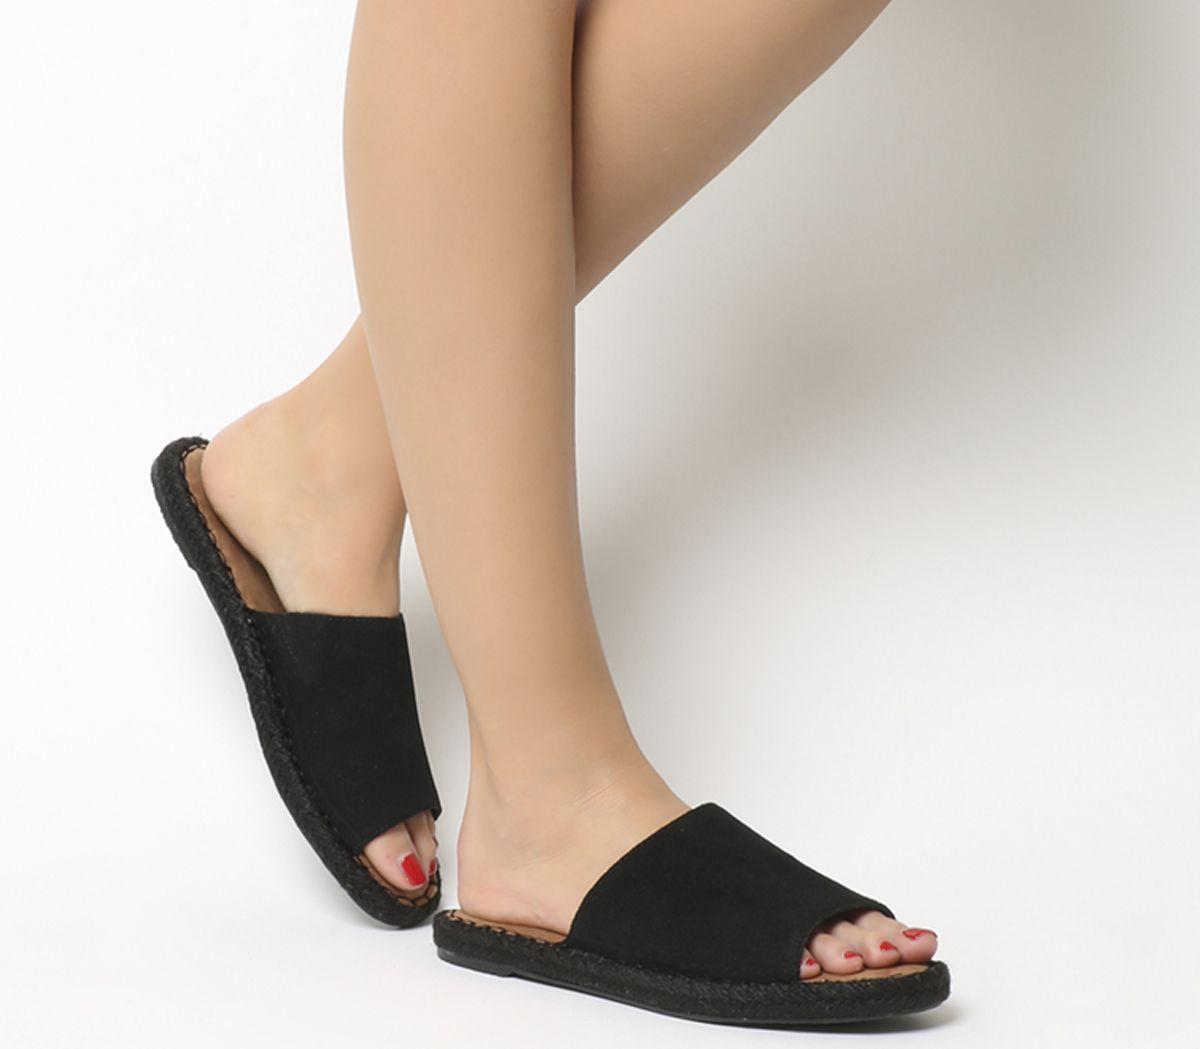 c714eacc72f Toms Clarita Sandals Black Suede - Sandals